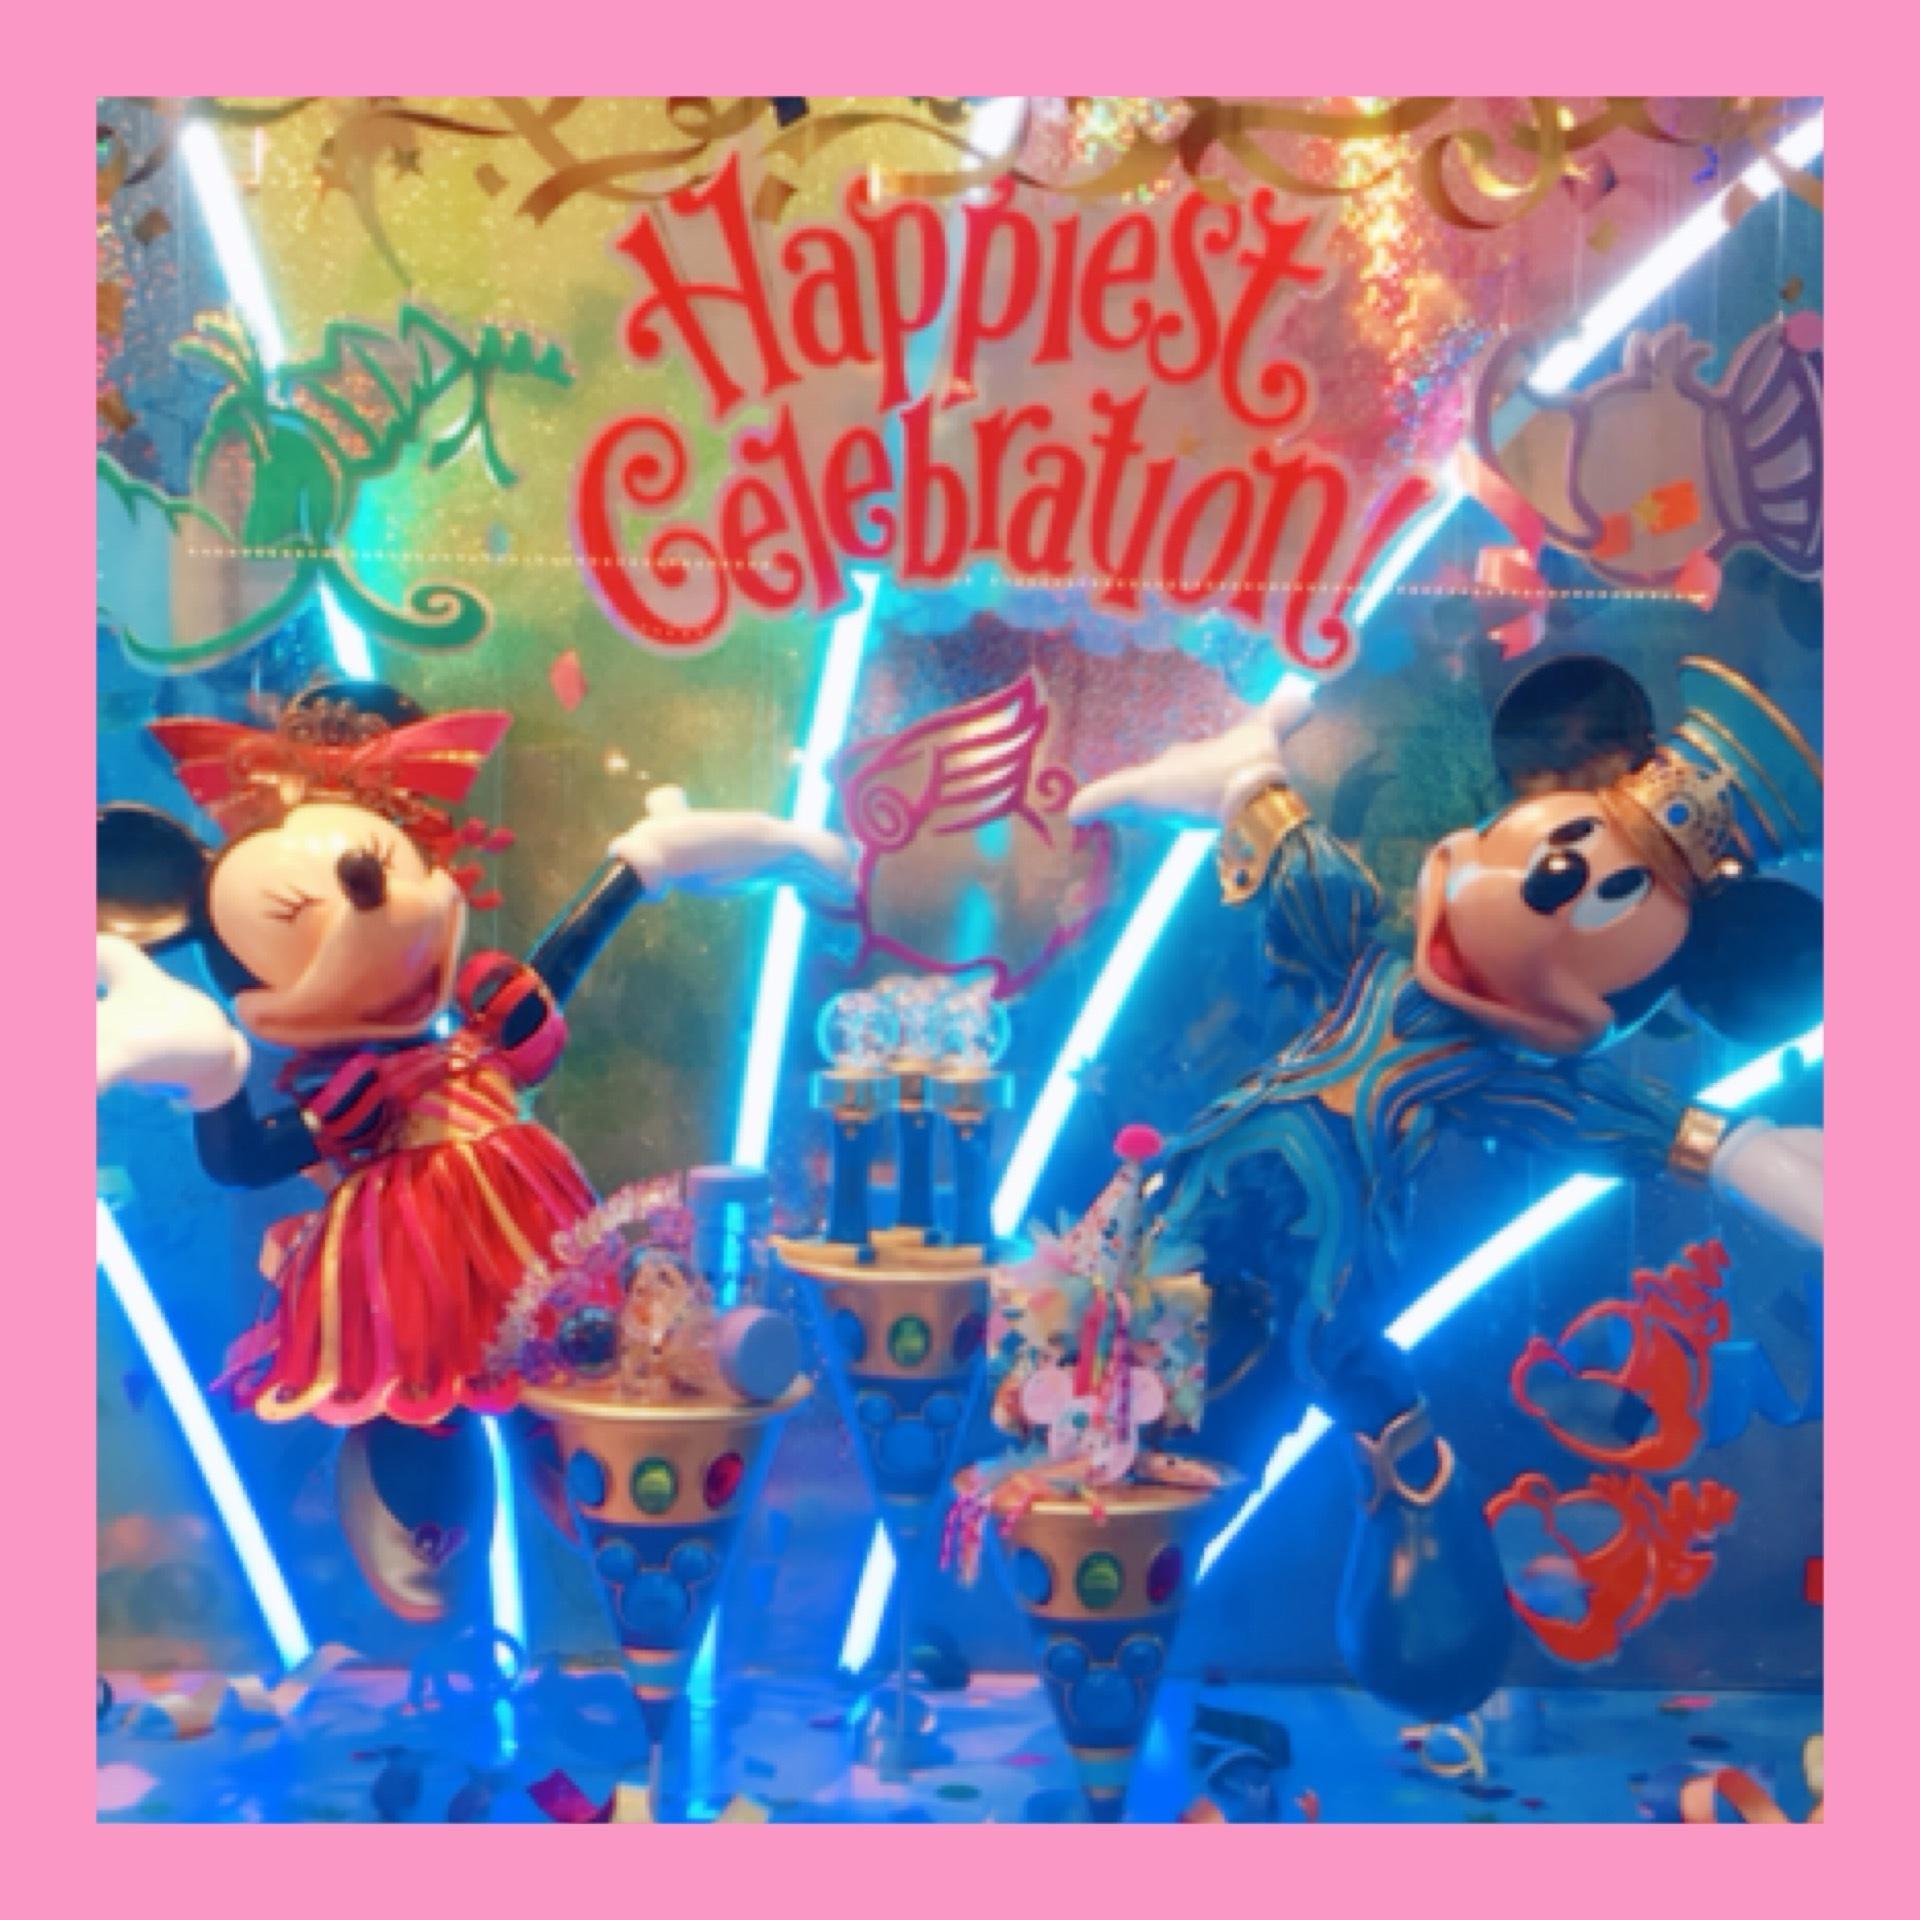 Tokyo Disneyland《 35 Happiest Gelebration! 》お土産編♫_1_1-1